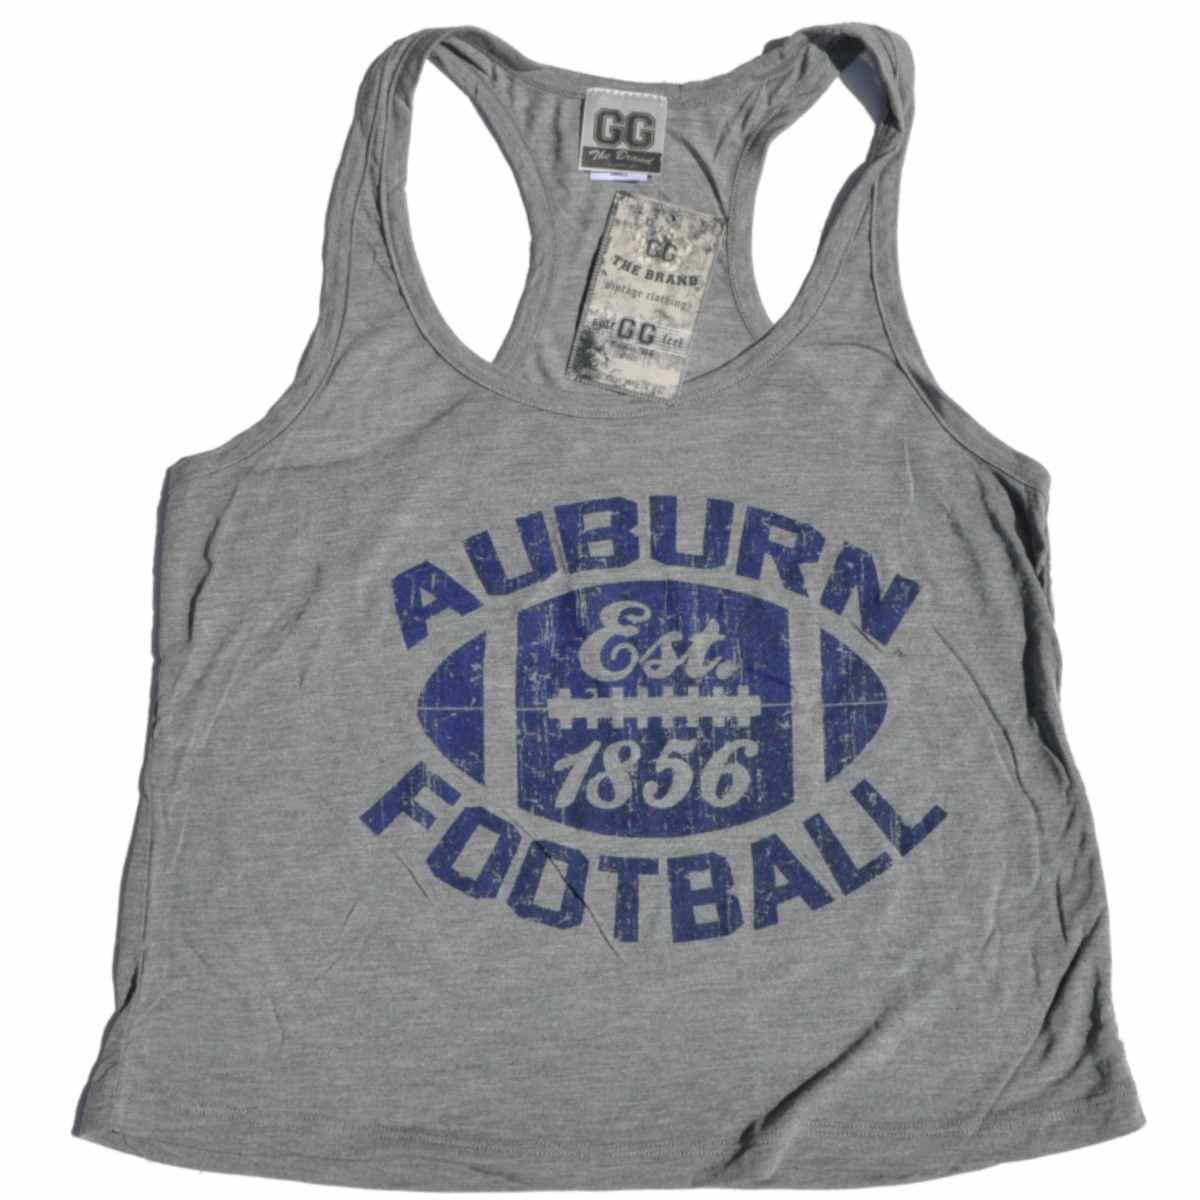 Auburn Tigers GG Women Gray Football Performance Loose Dance Tank Top by